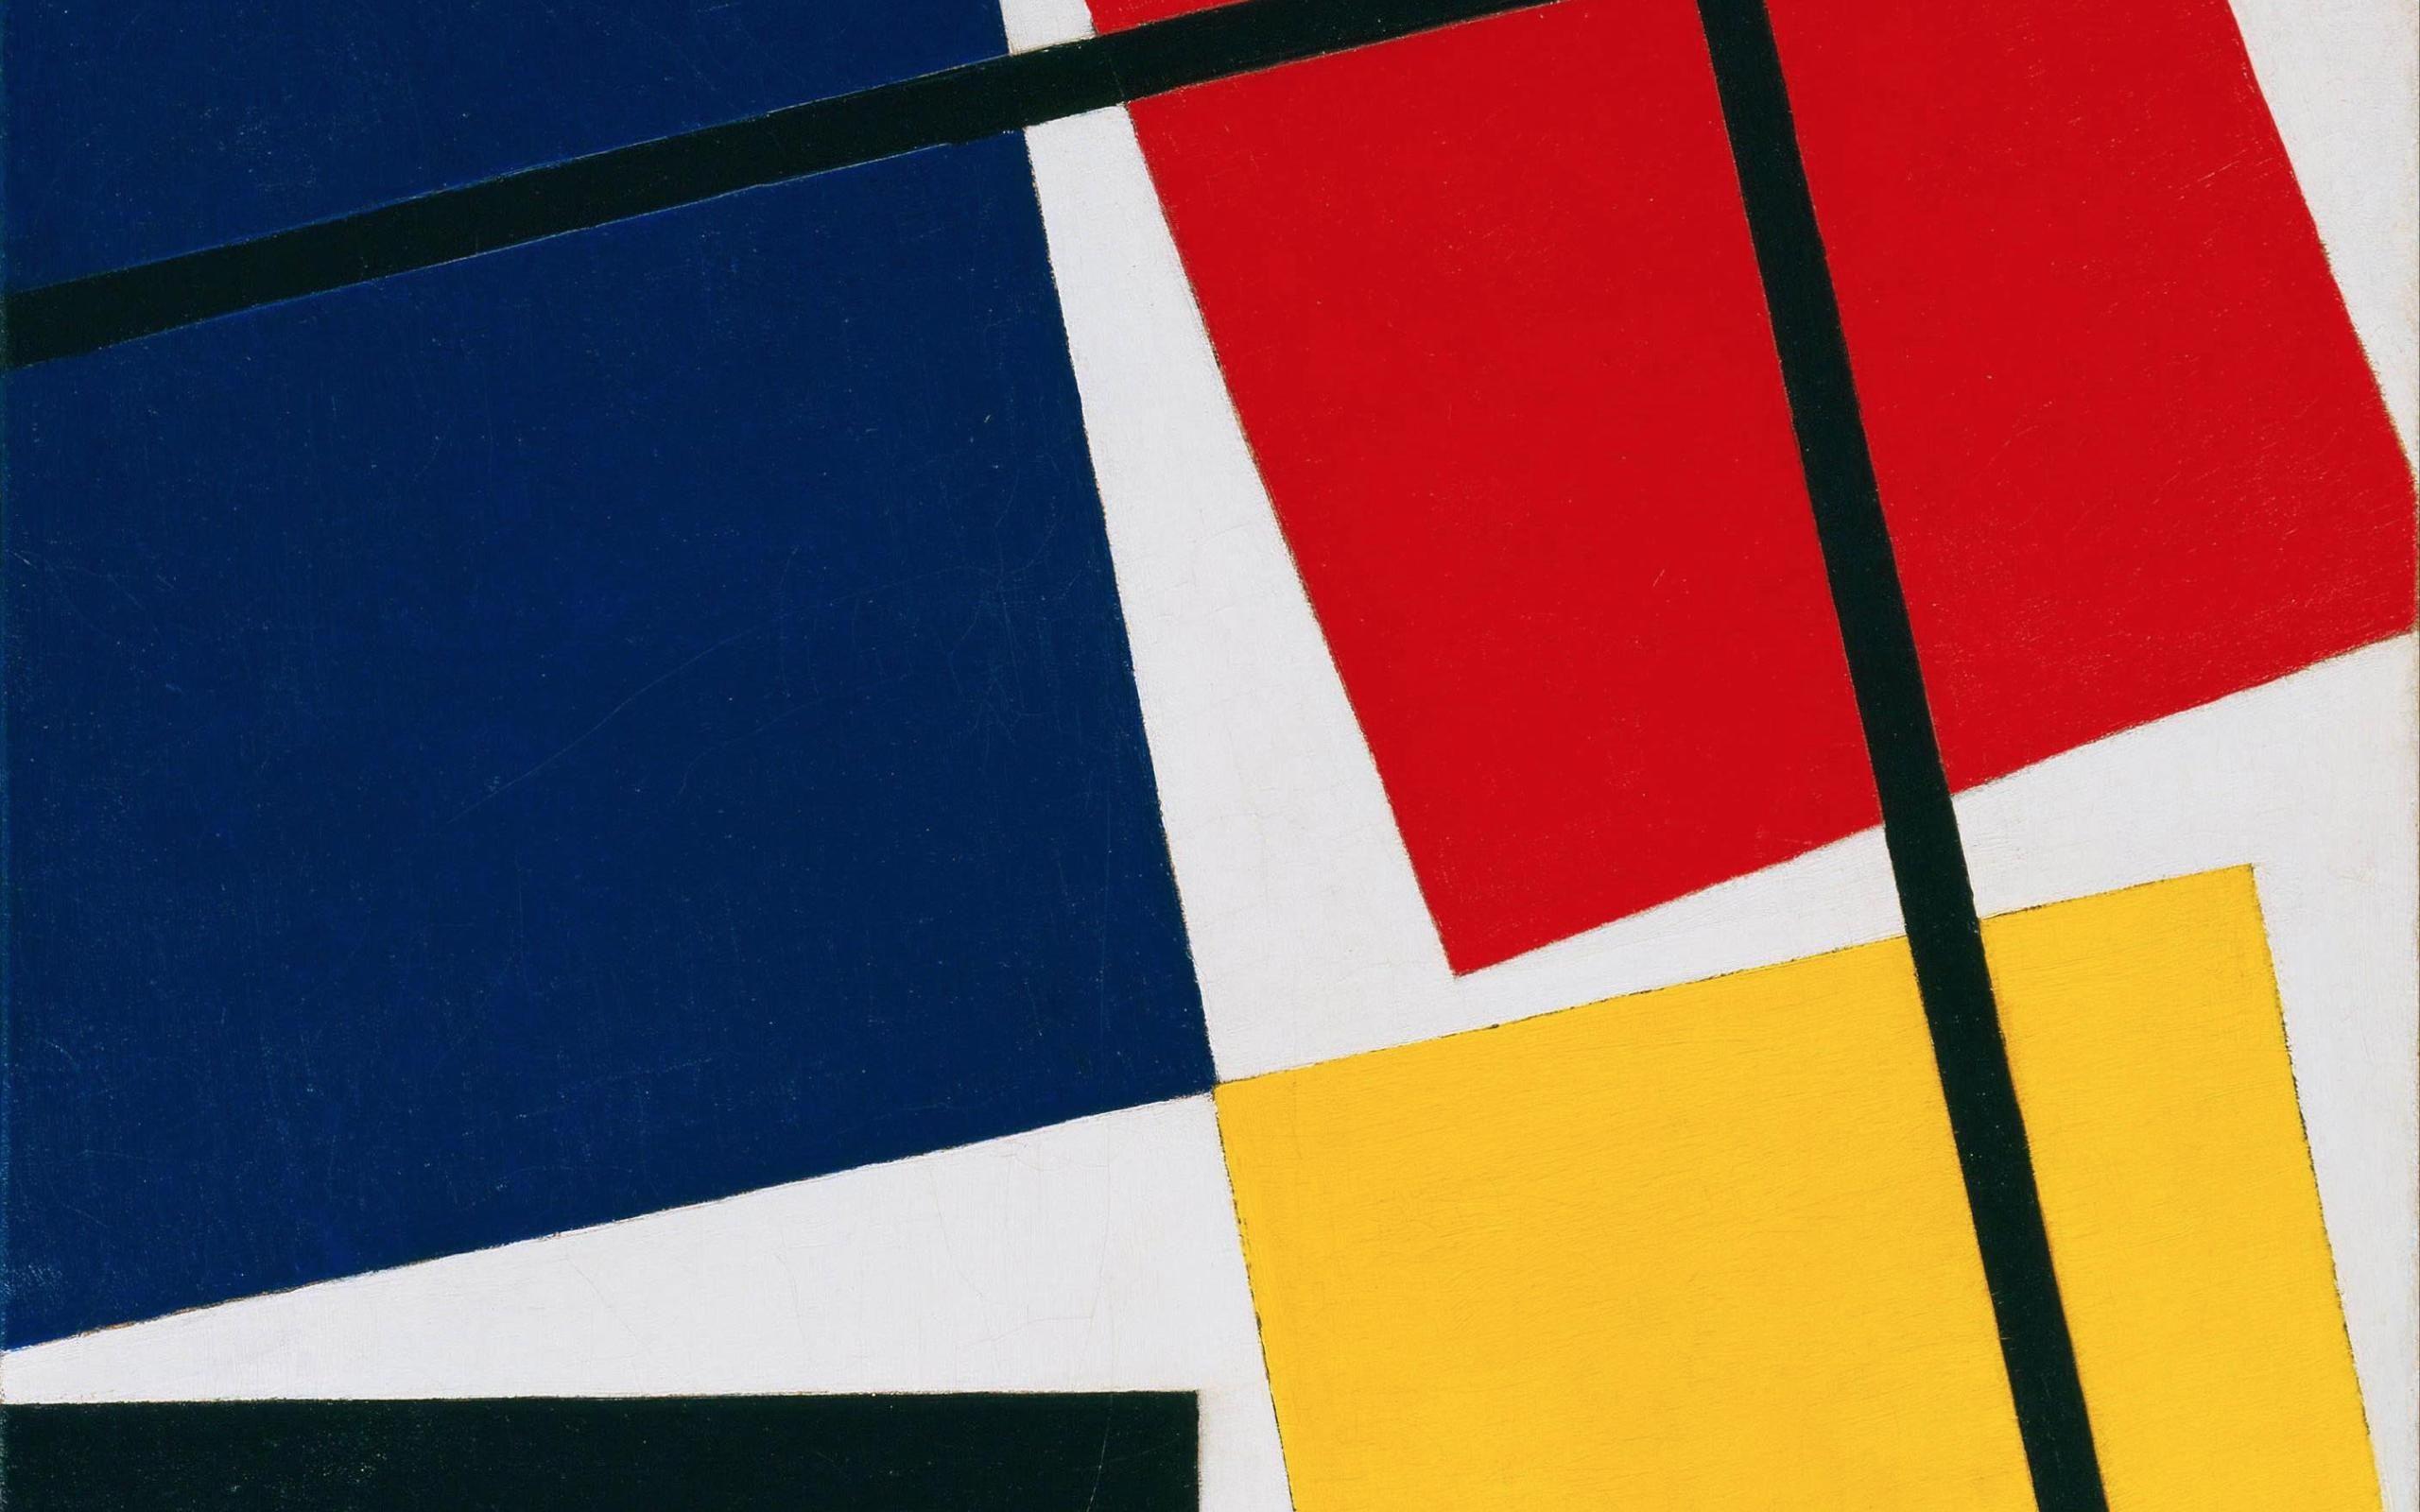 Piet Mondrian Mondrian Texture Colorful Abstract Red 2560x1600 Wallpaper Wyxevx Wallhaven Cc Piet Mondrian Mondrian Piet